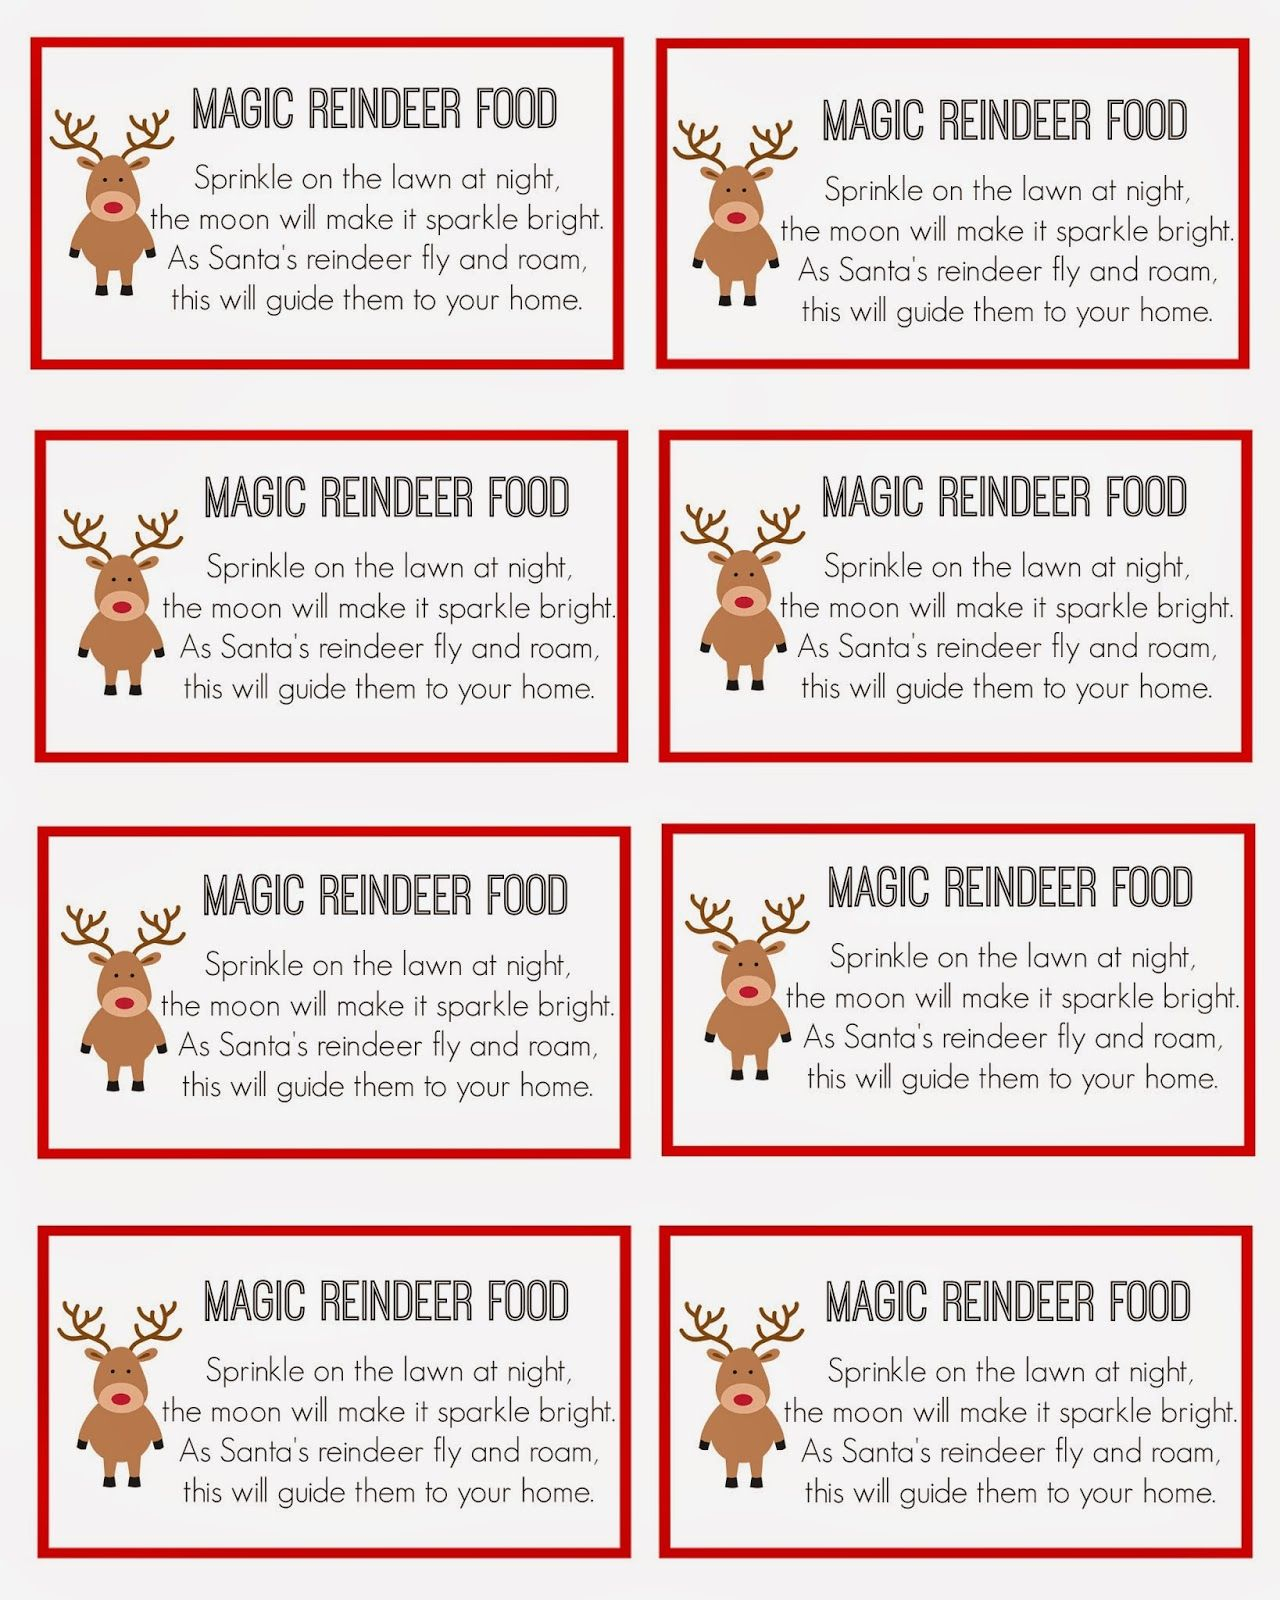 Magic Reindeer Food | Christmas | Magic Reindeer Food, Reindeer Food - Reindeer Food Poem Free Printable